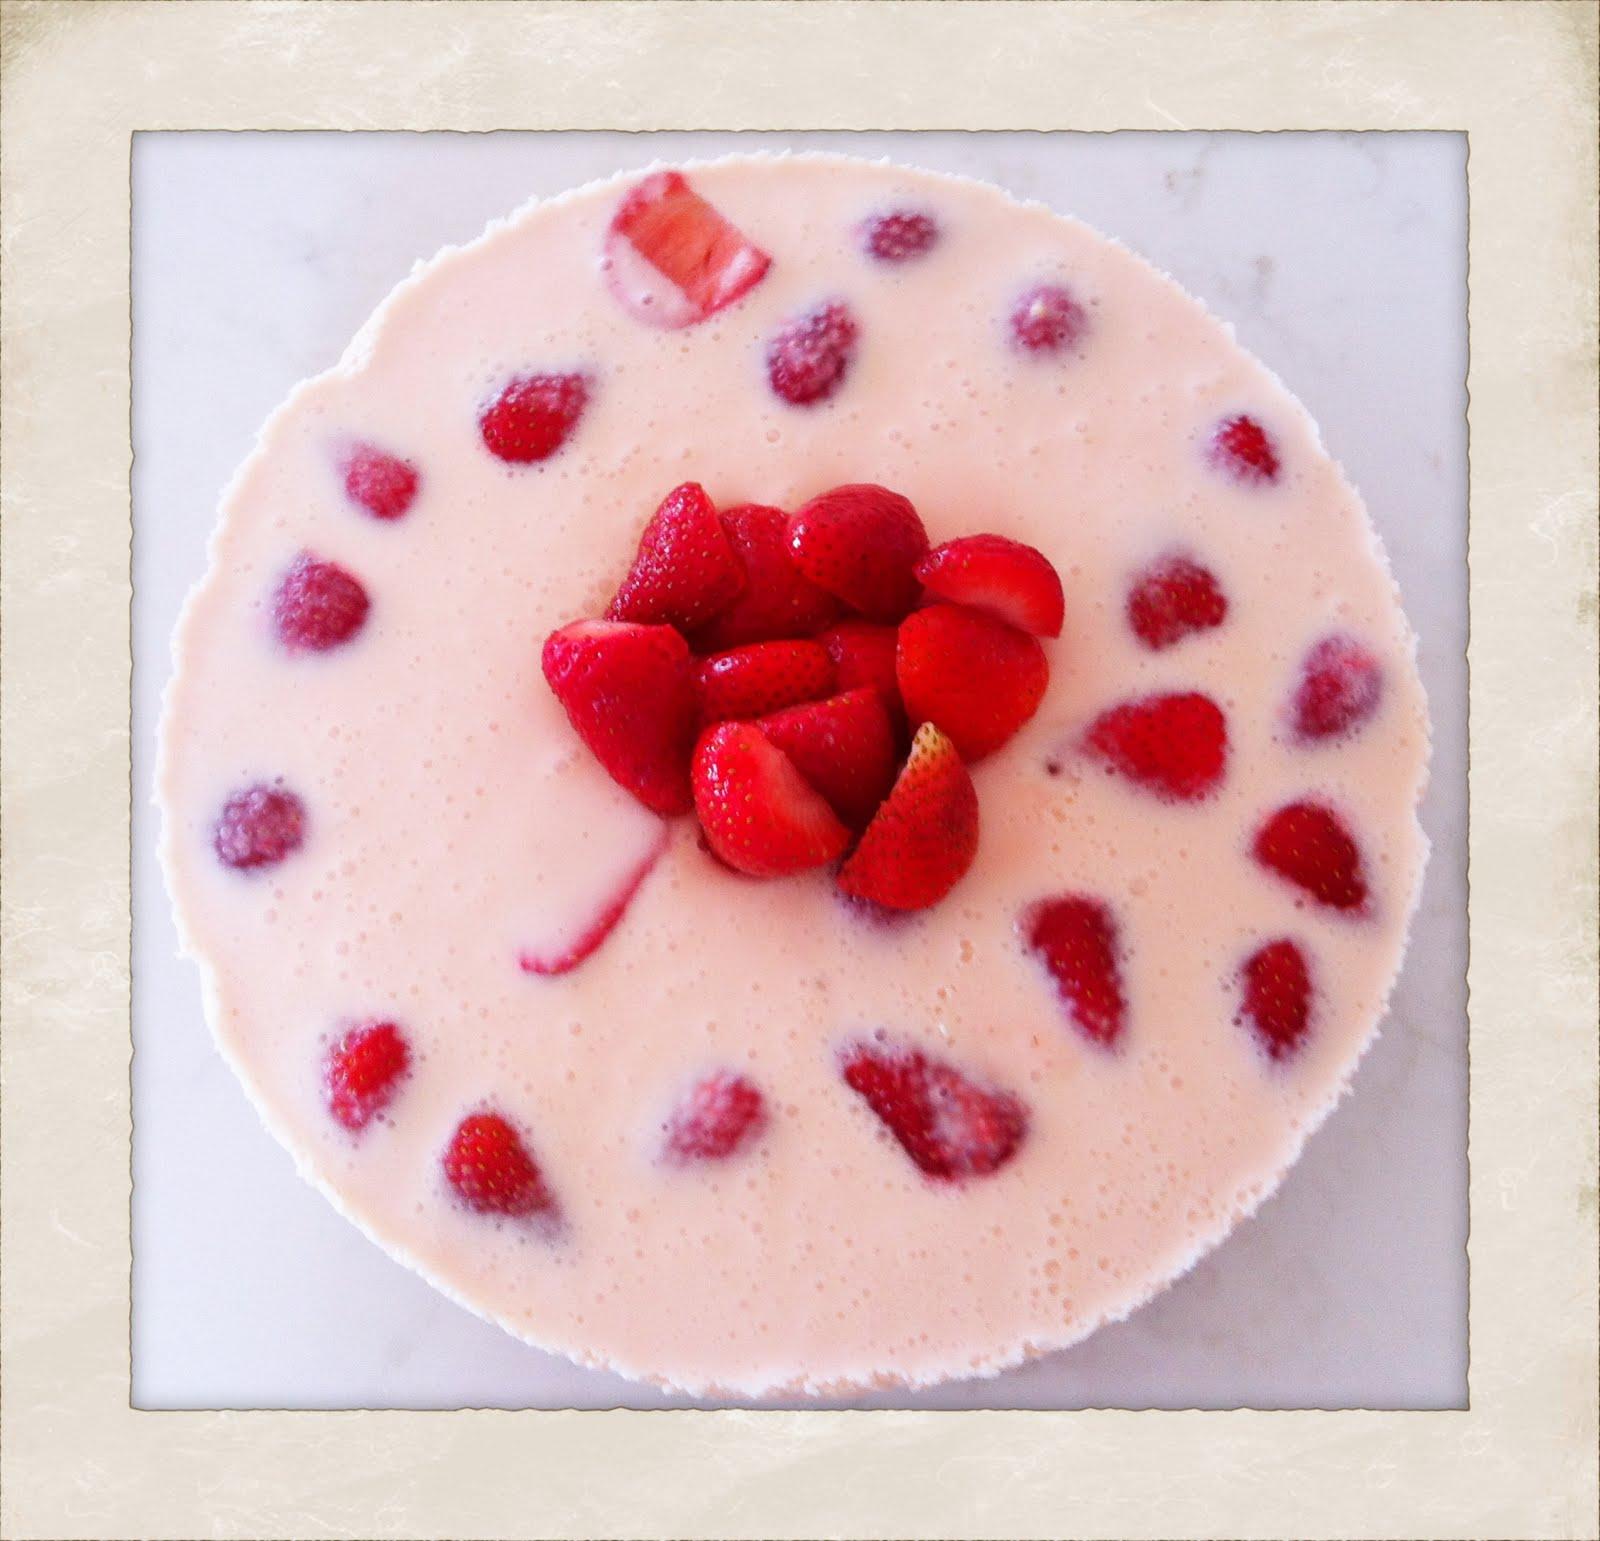 strawberries cointreau and cream cheesecake